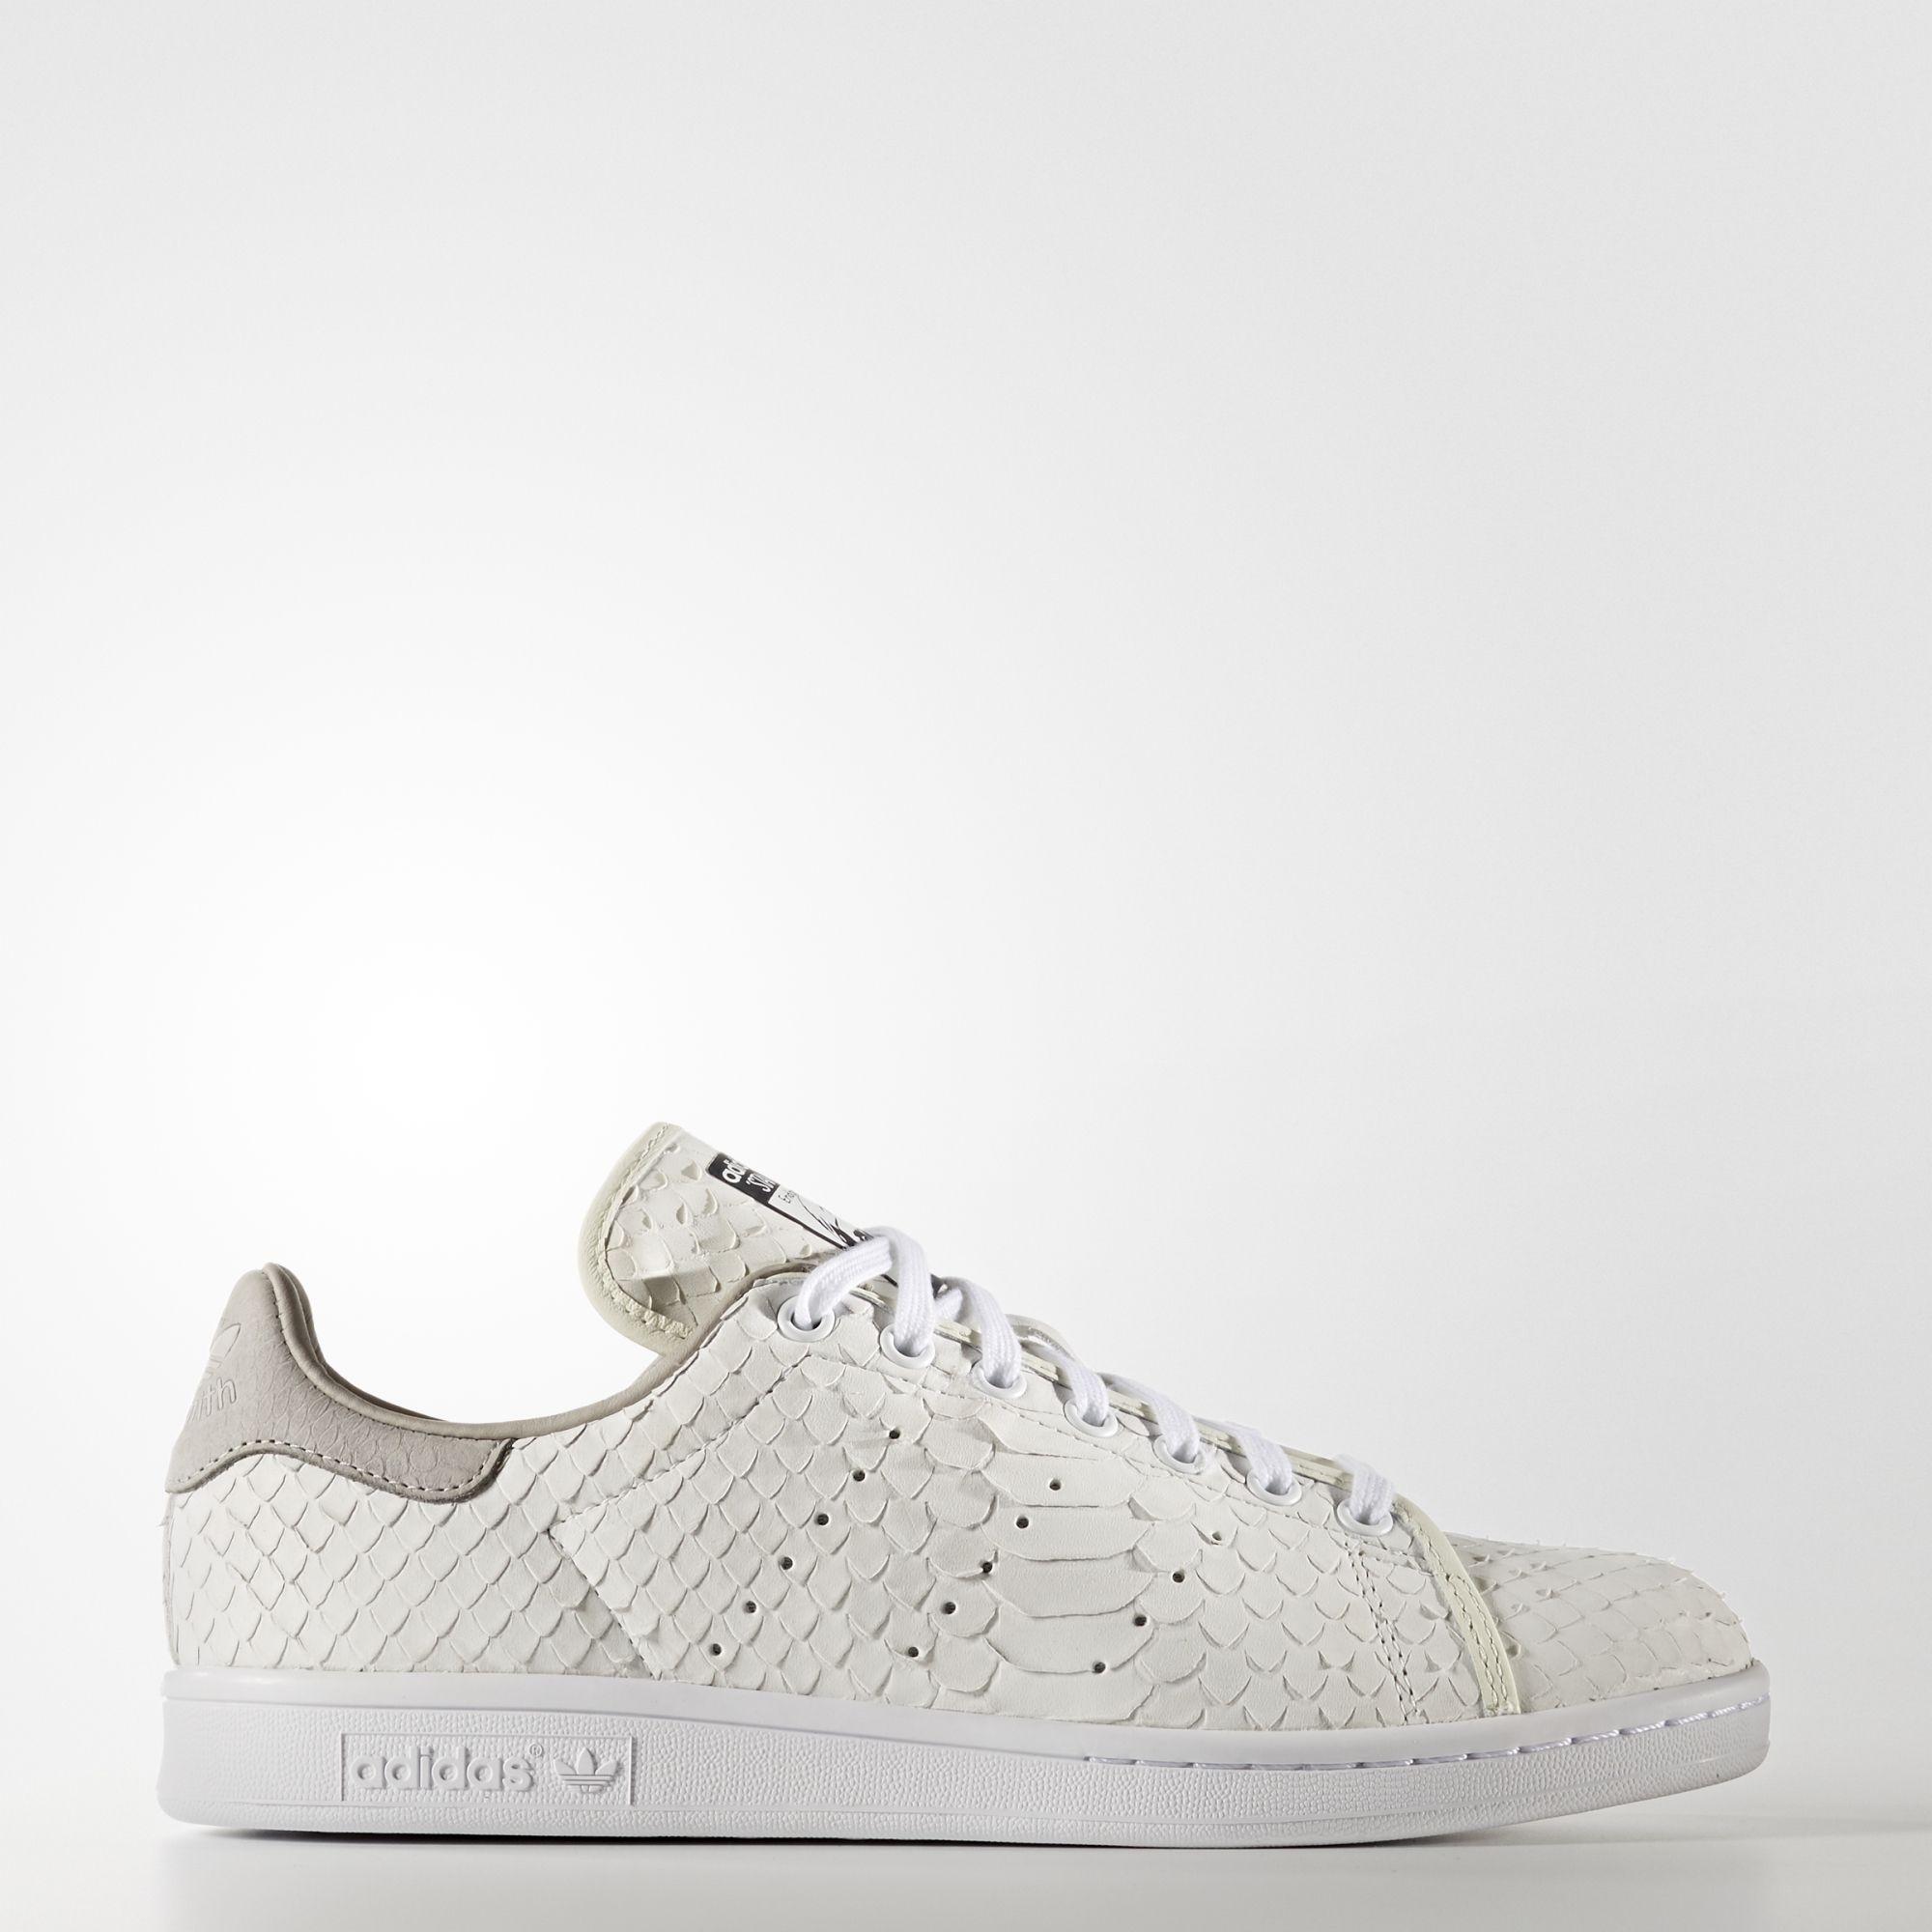 Adidas Smith Cheap White Fc77c 26a57 Stan Deacon nOP0k8wX